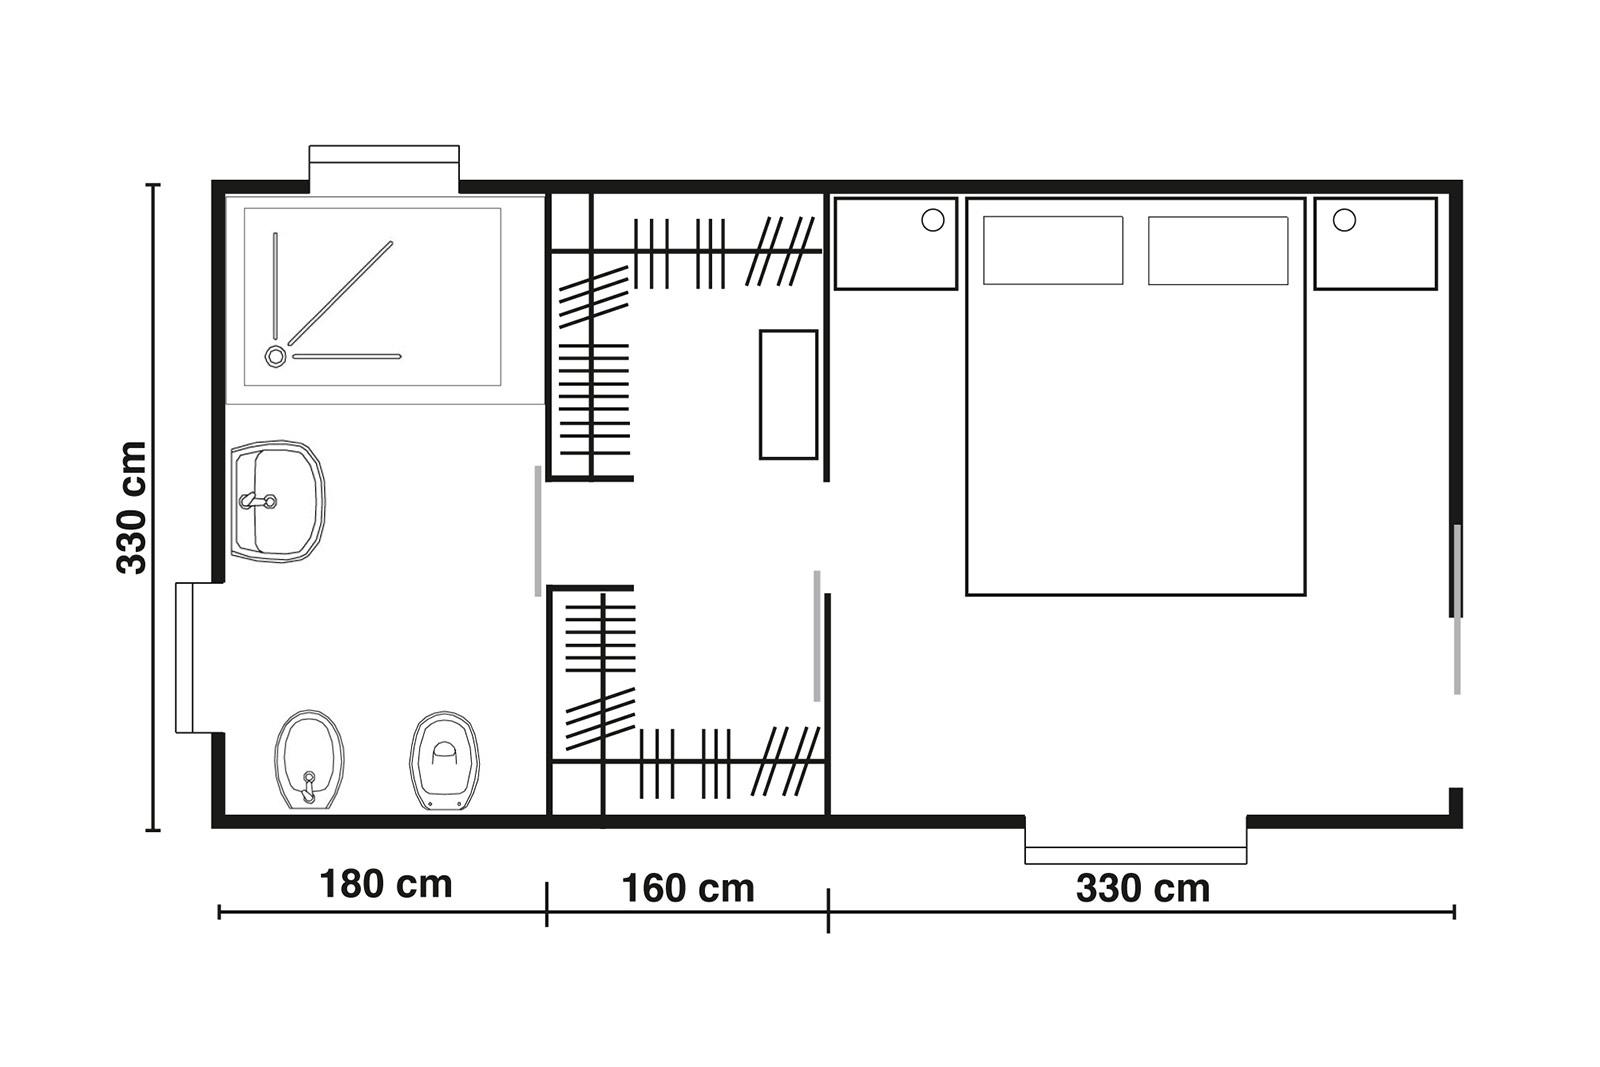 costruire cabina armadio su misura: armadi su misura garnero ... - Costruire Cabina Armadio Su Misura